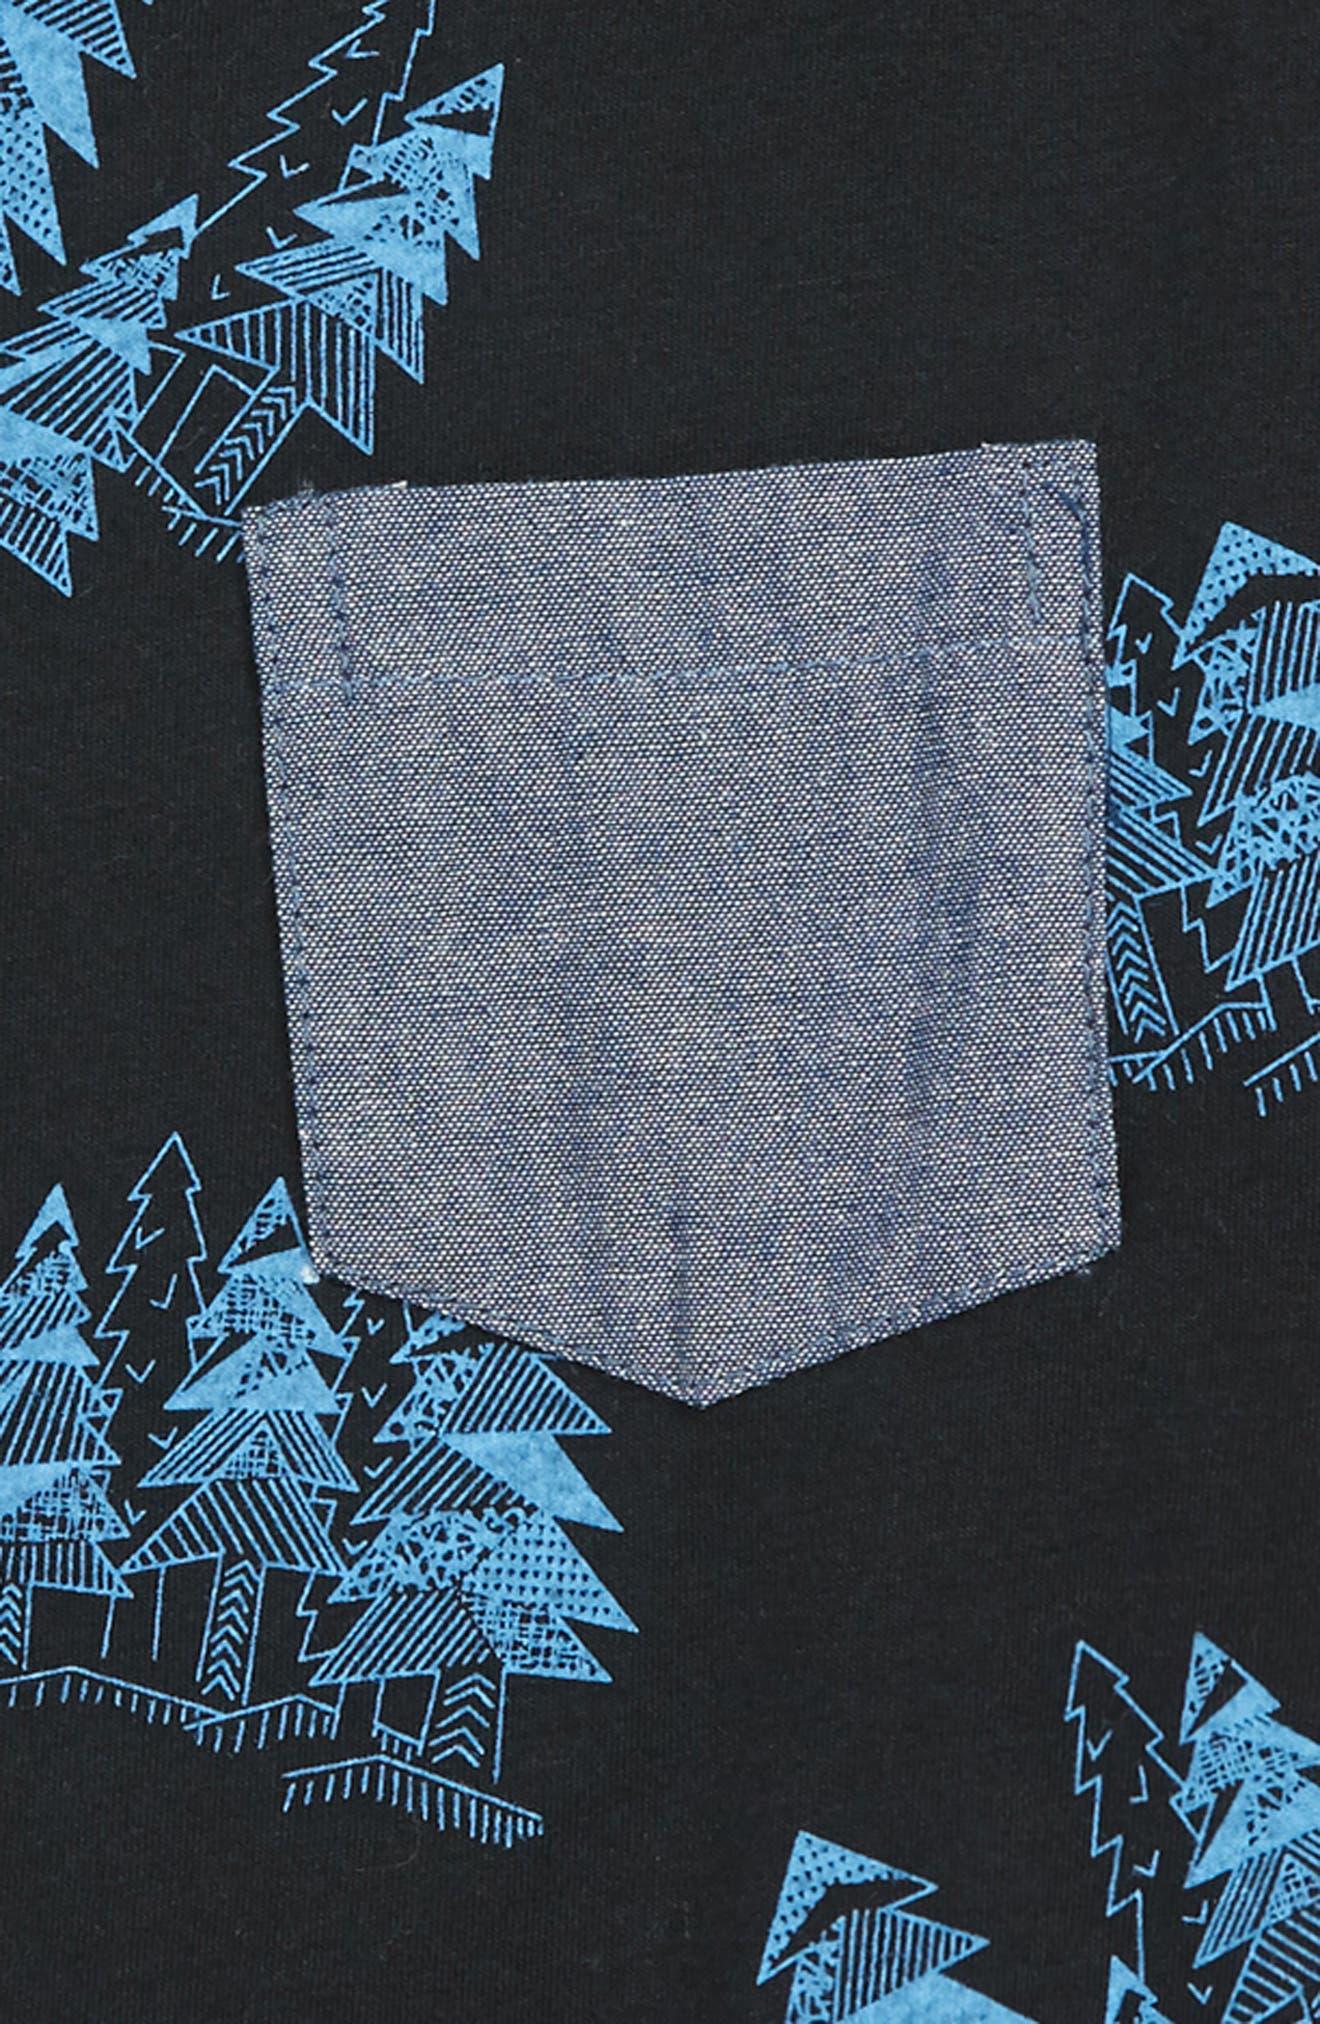 Trav Pocket T-Shirt,                             Alternate thumbnail 2, color,                             SPRUCE